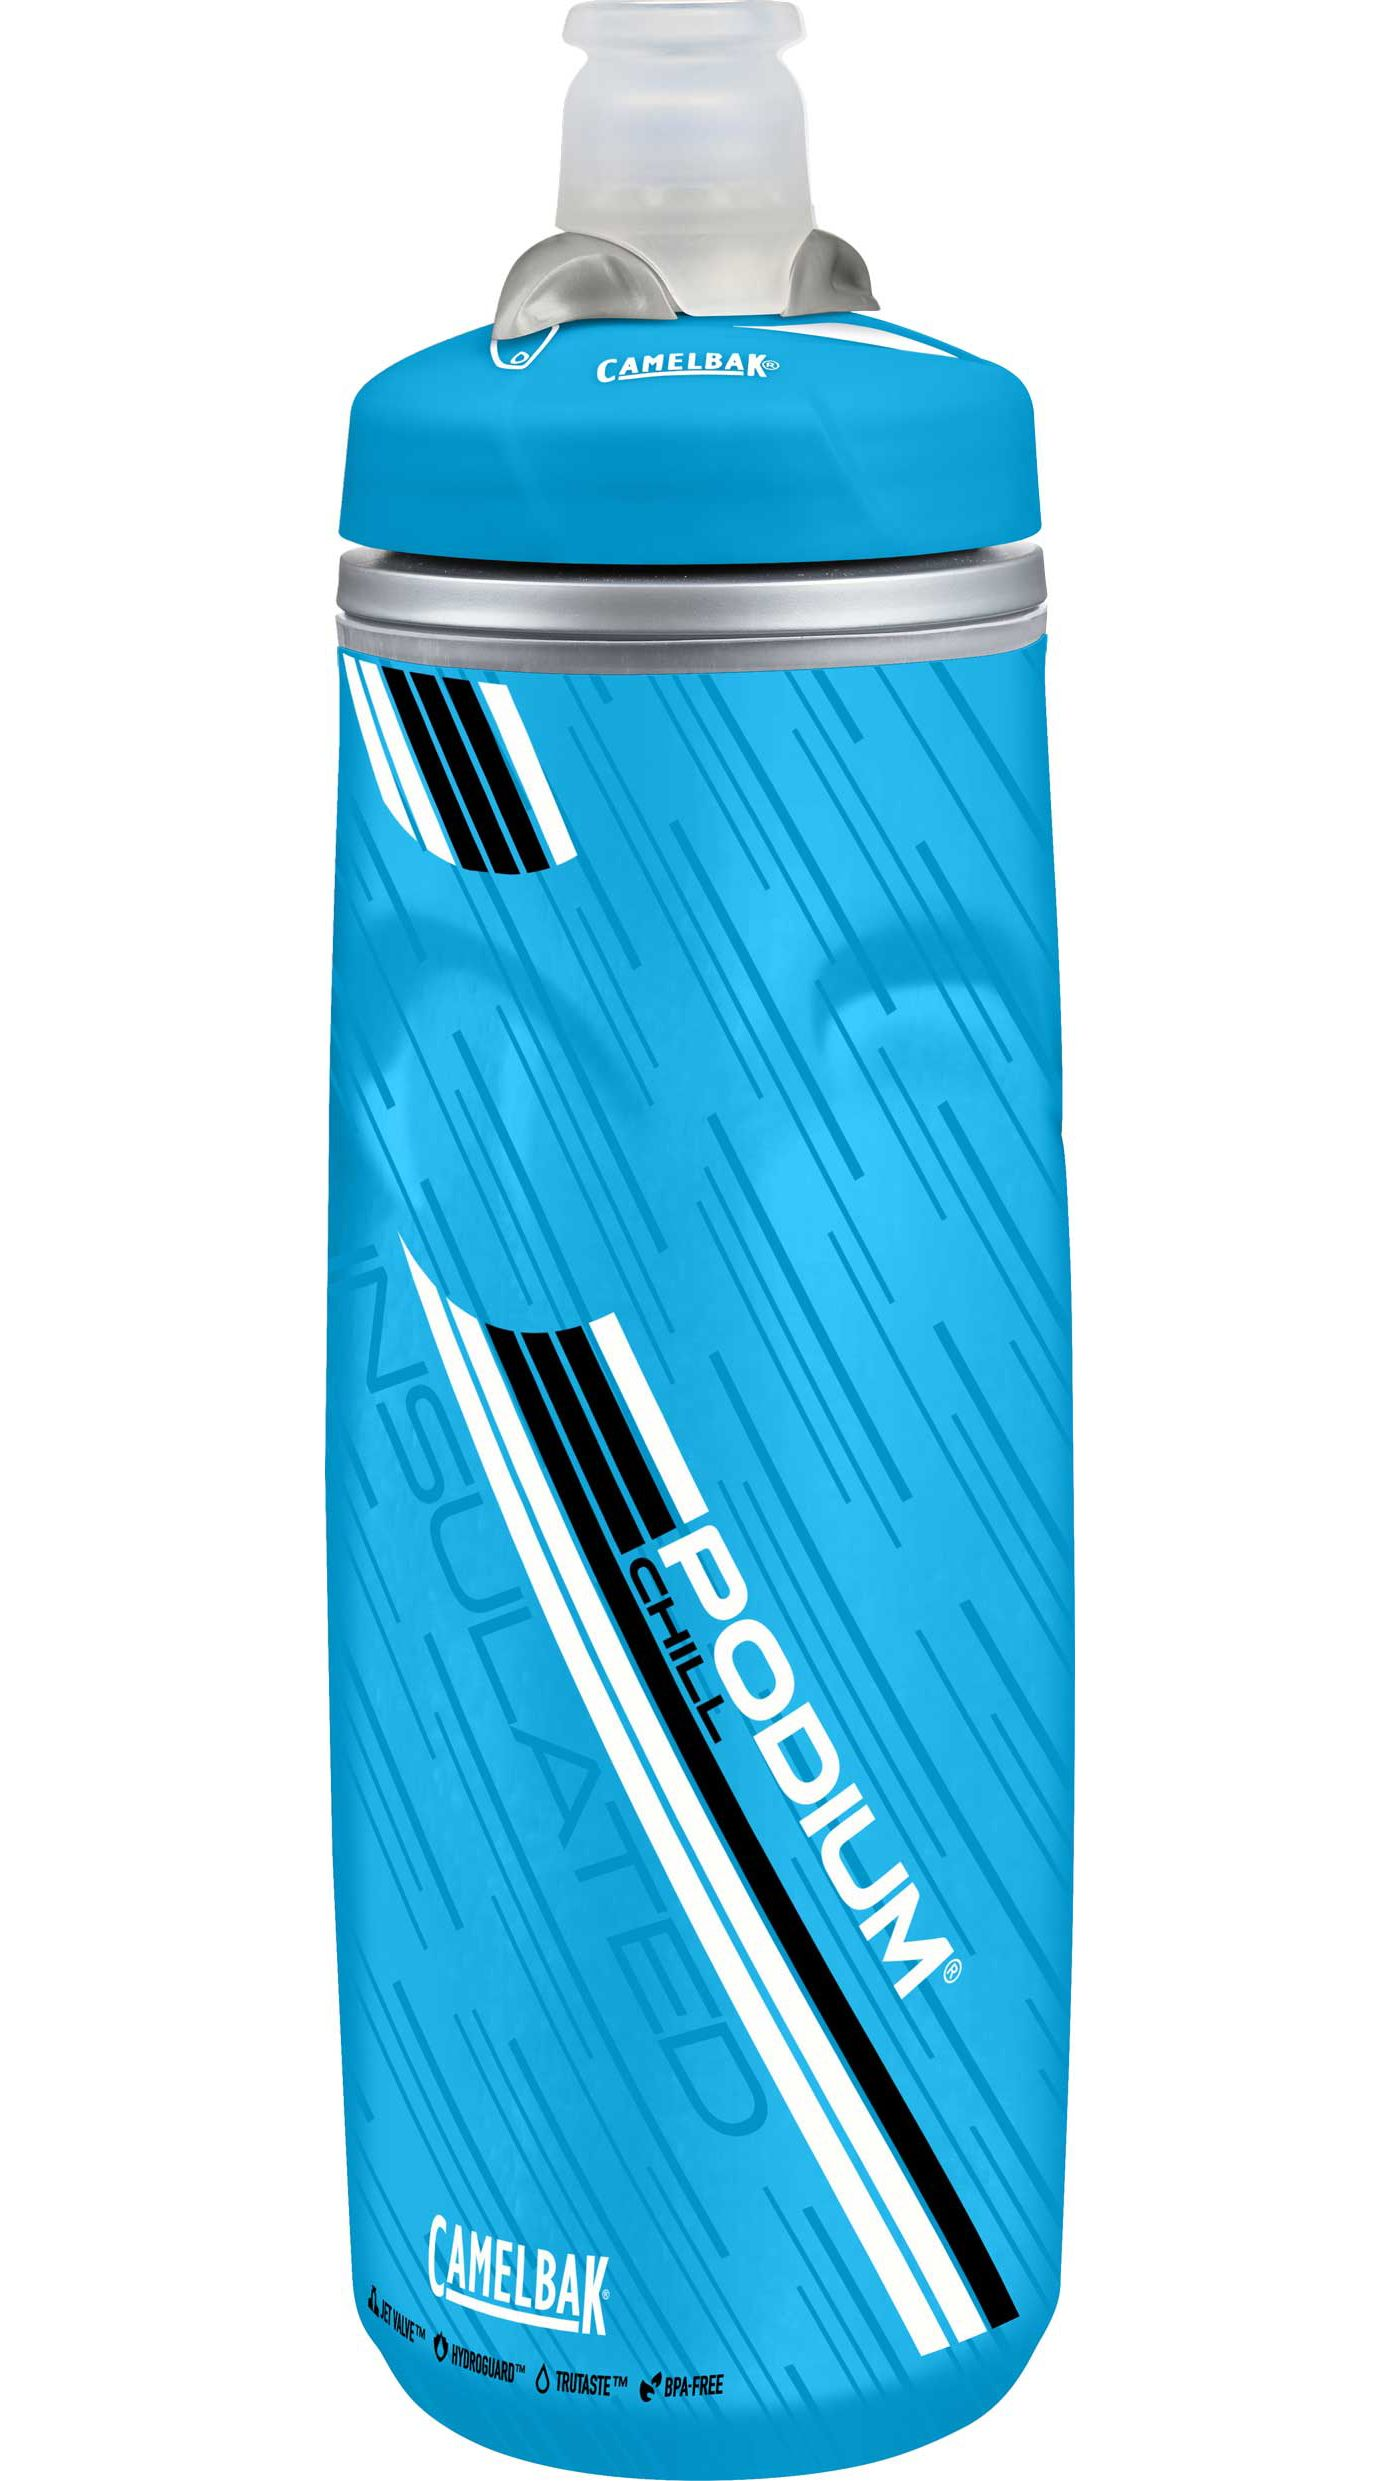 CamelBak Podium Chill 21 oz. Water Bottle